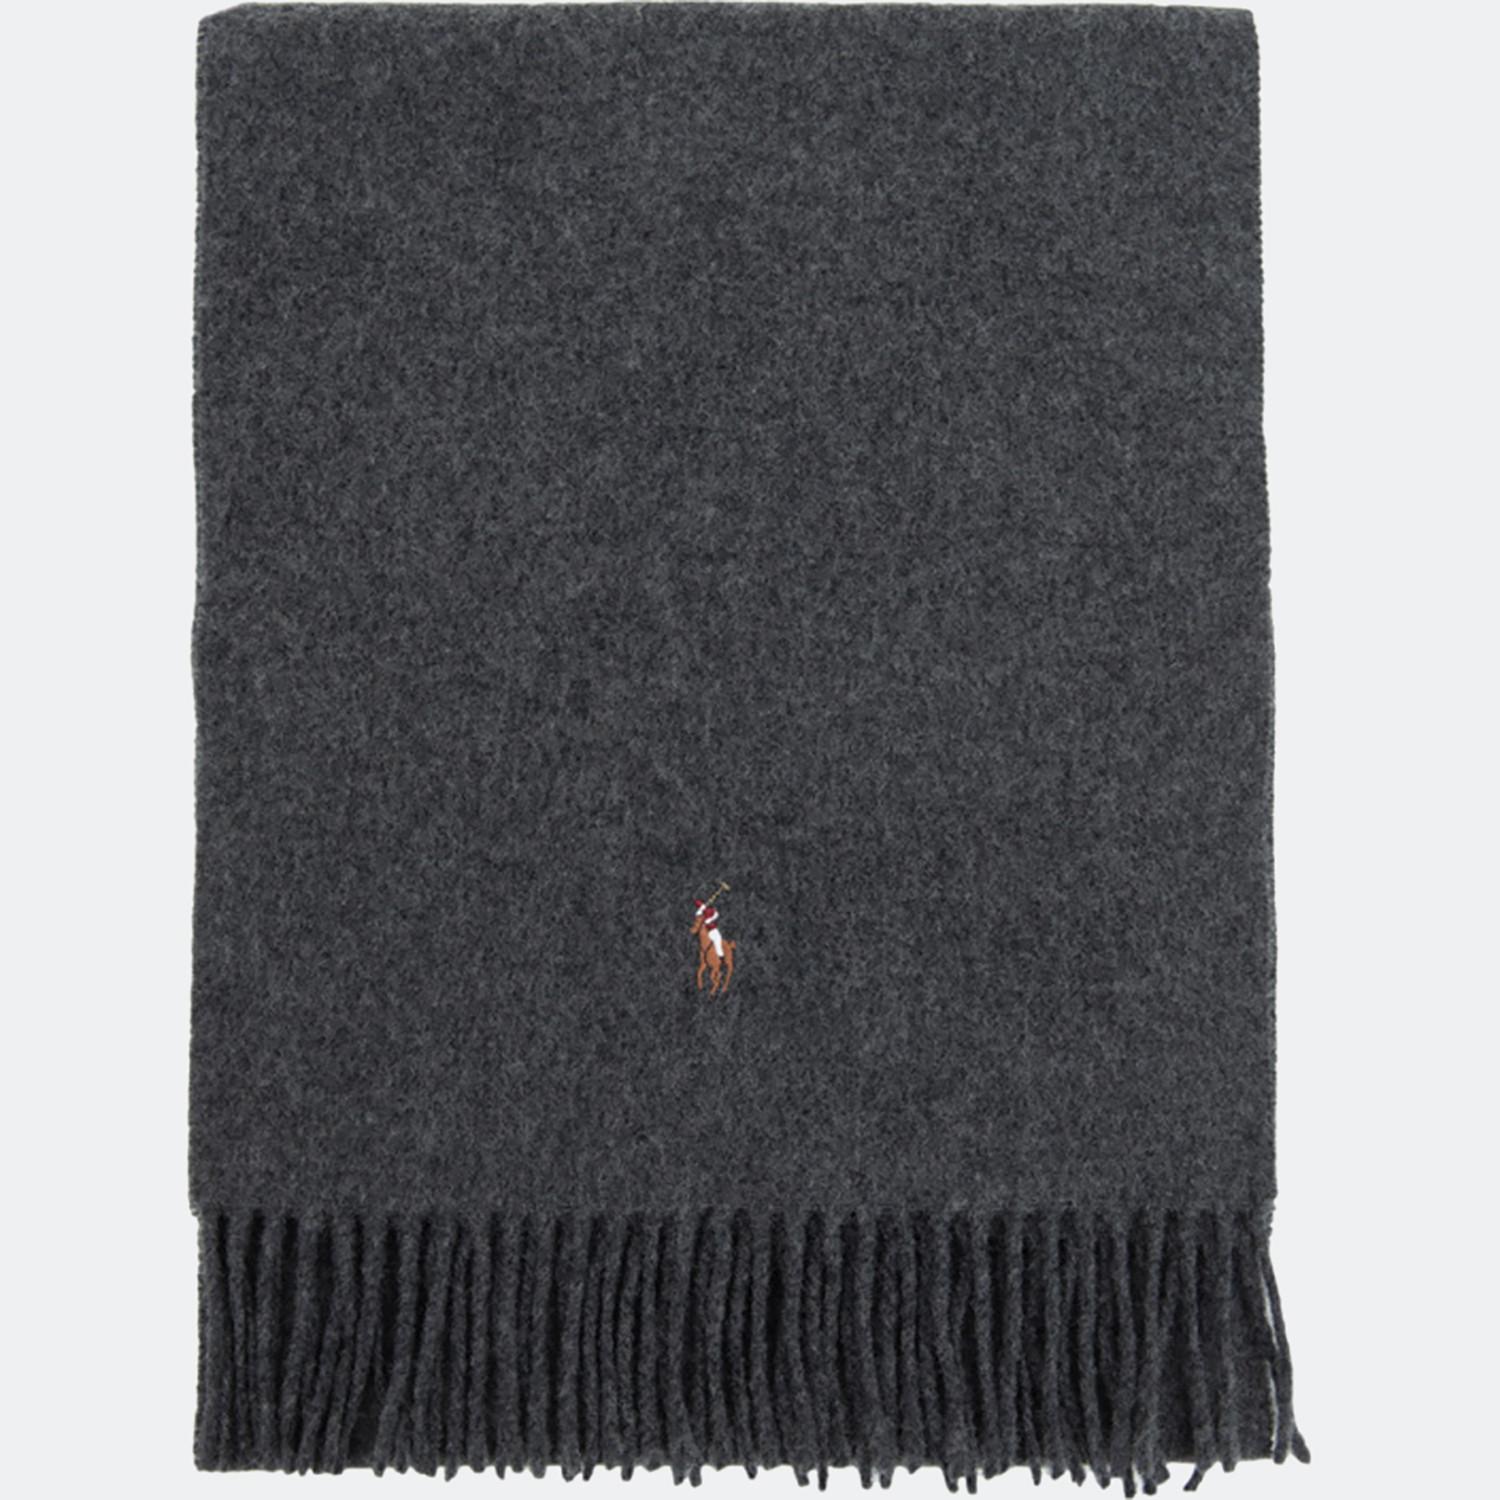 Polo Ralph Lauren Sign It Wool Oblong Ανδρικό Κασκόλ (9000064626_49050)